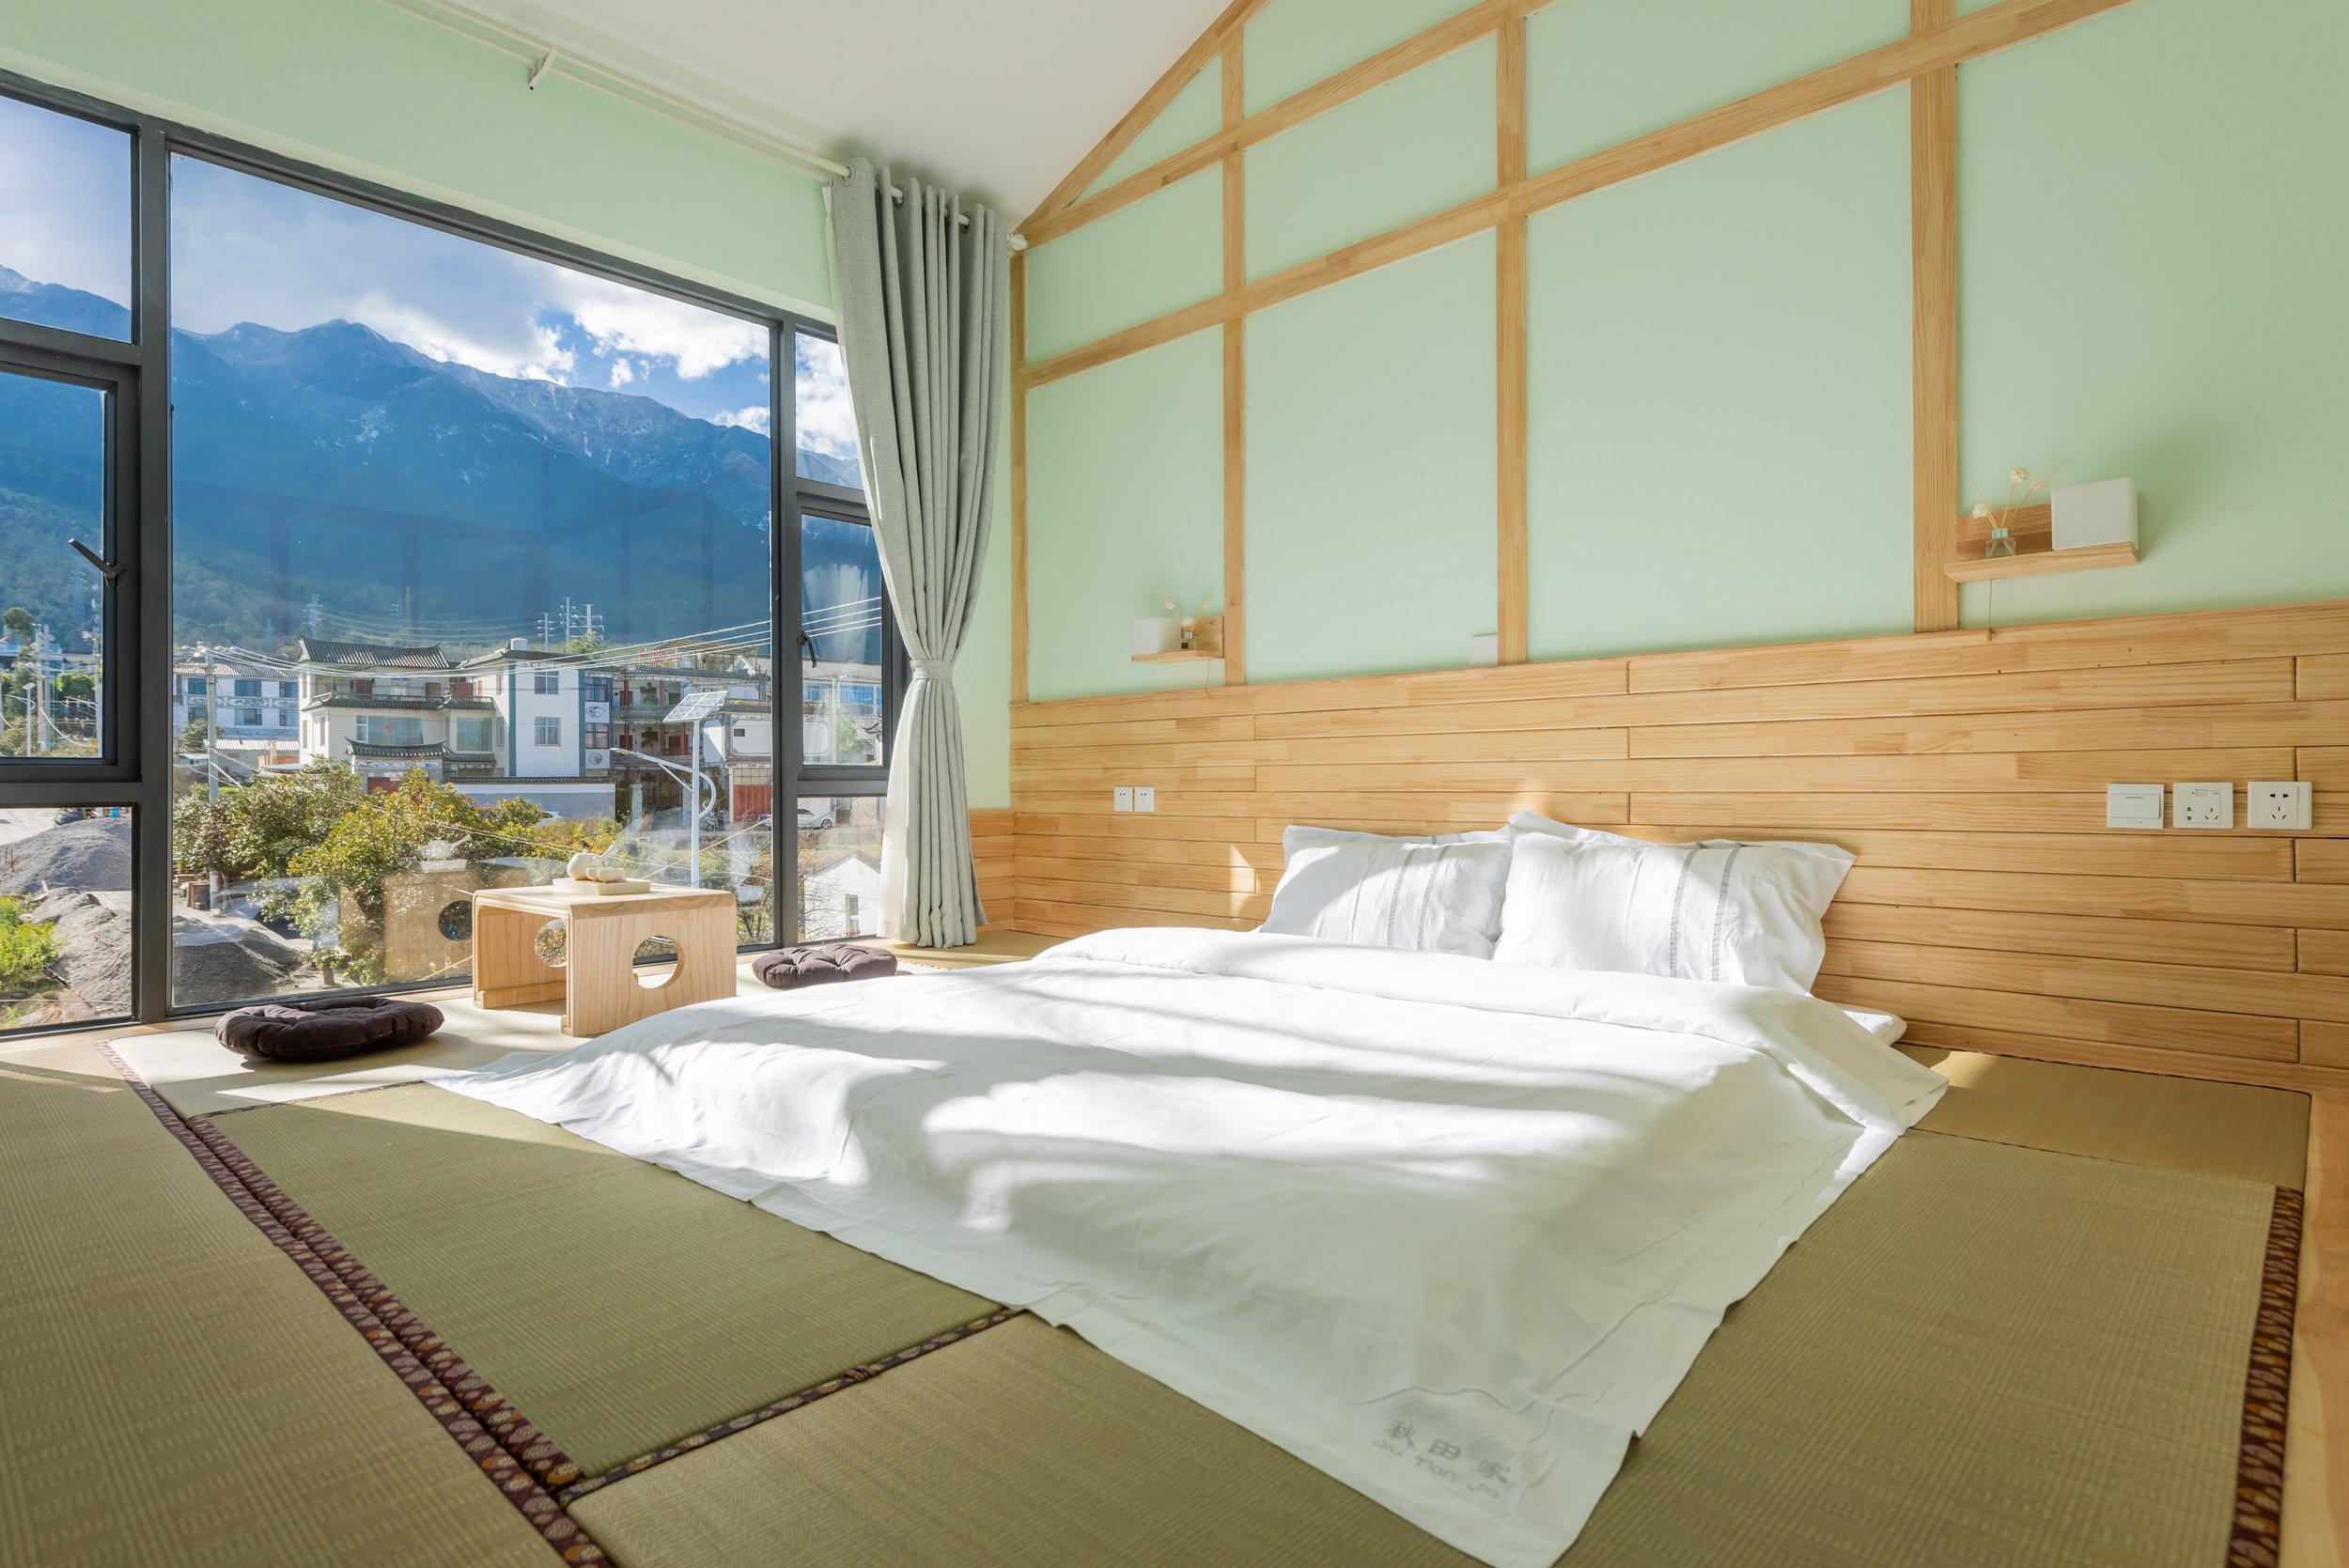 Guest Room 1 @Akitaya Guesthouse Dali 大理秋田家精品客栈